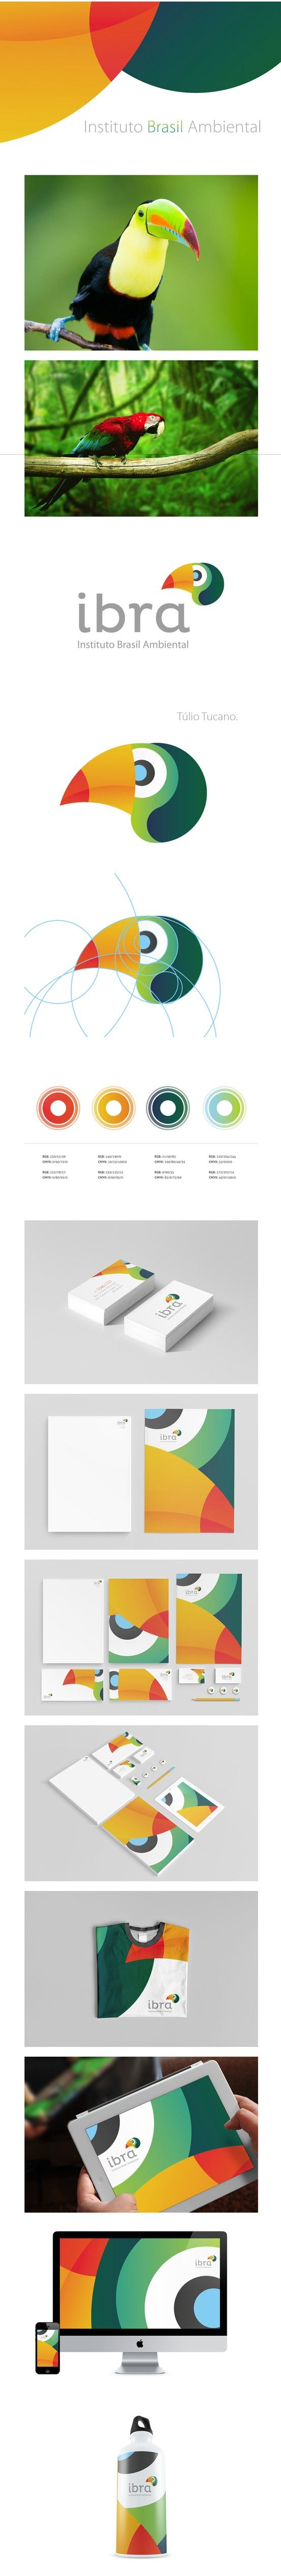 IBRA #brand and #identity elements